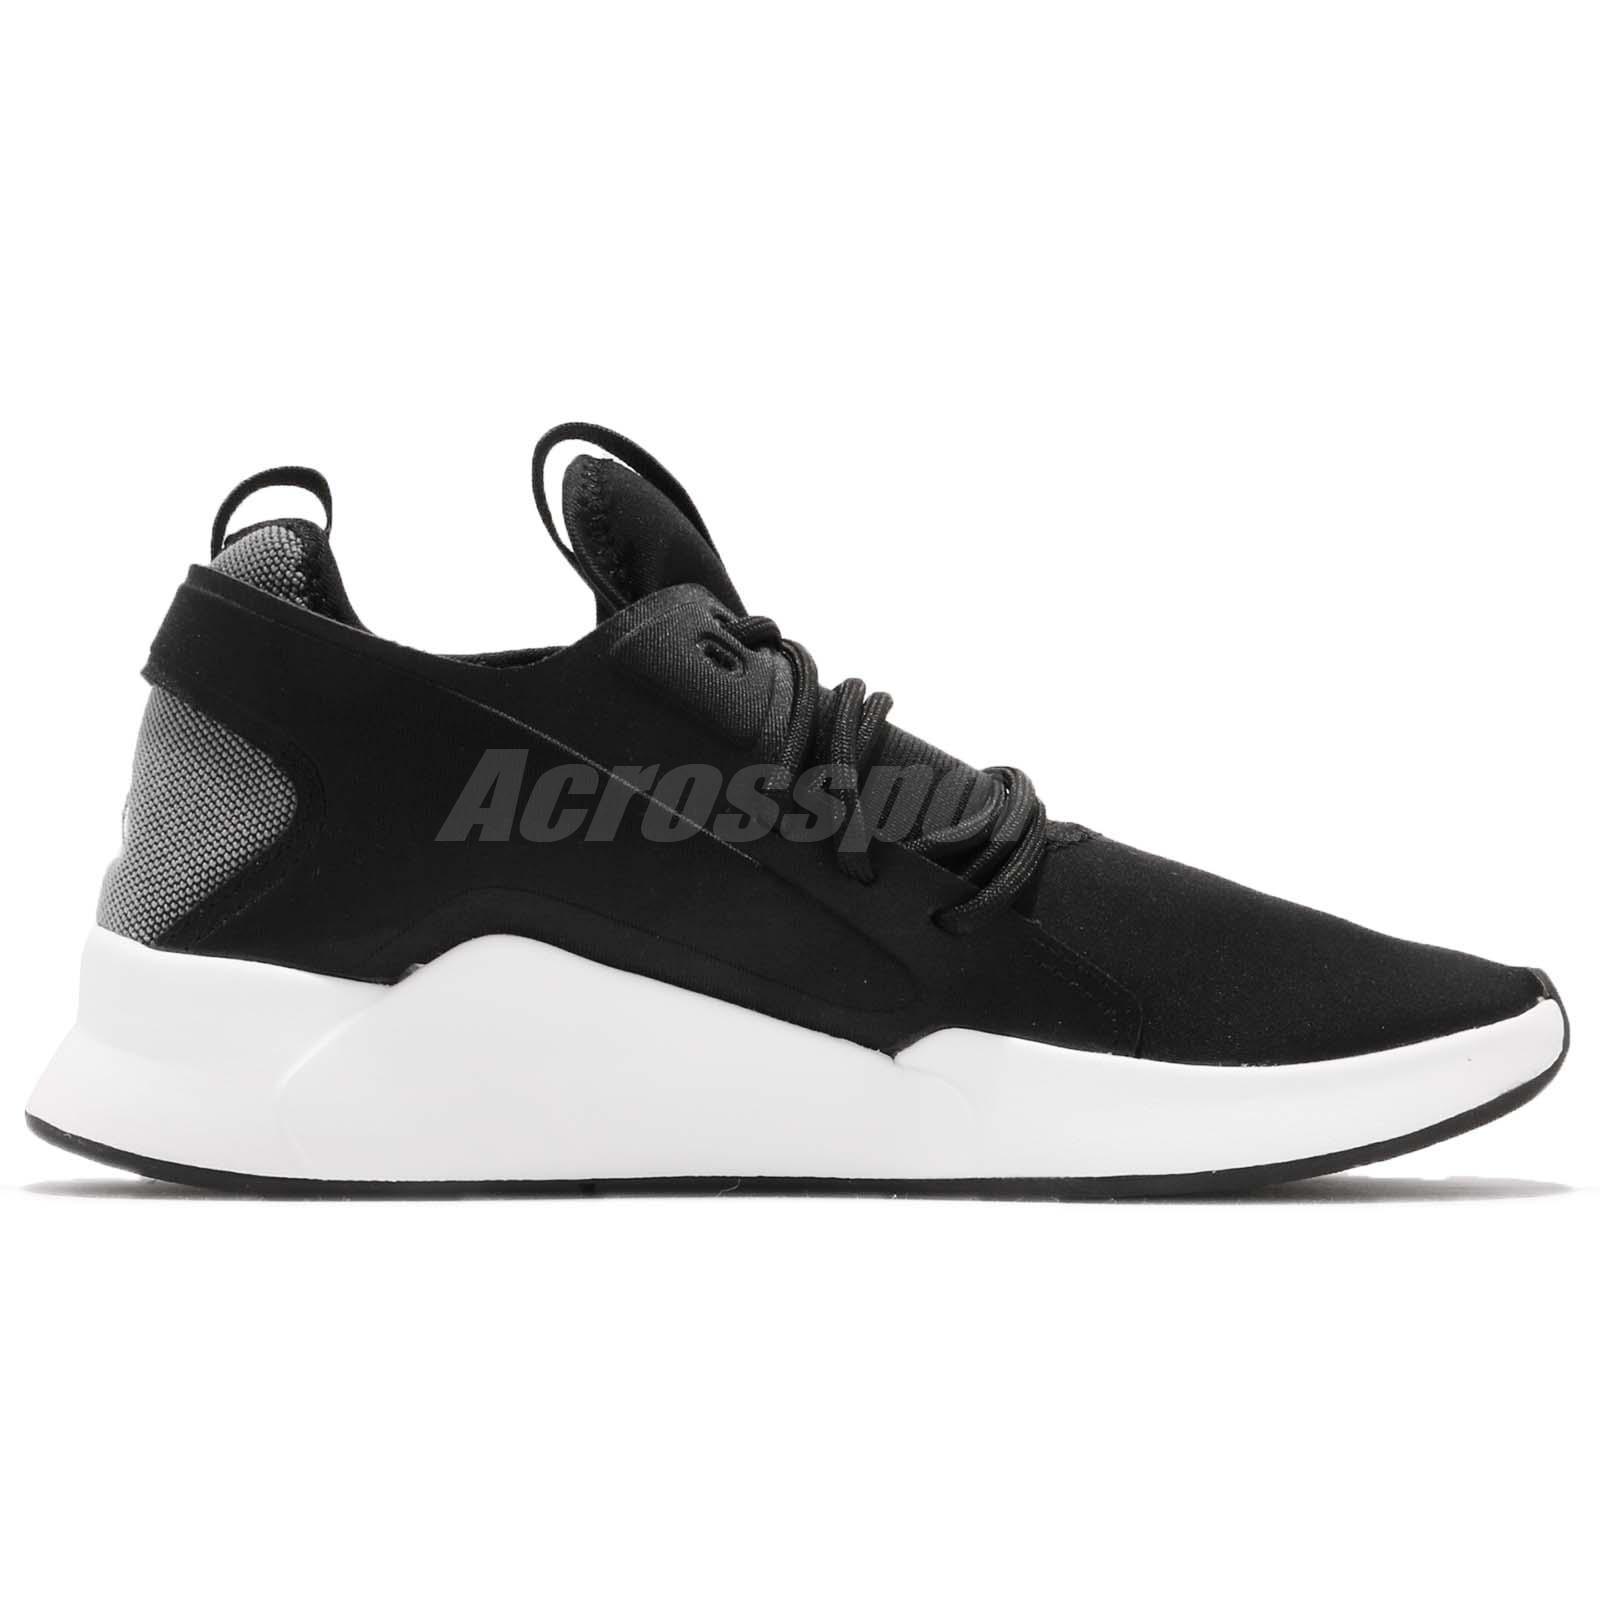 Reebok Guresu 2.0 Black White Women Cross Training Fitness Shoes ... 900028754